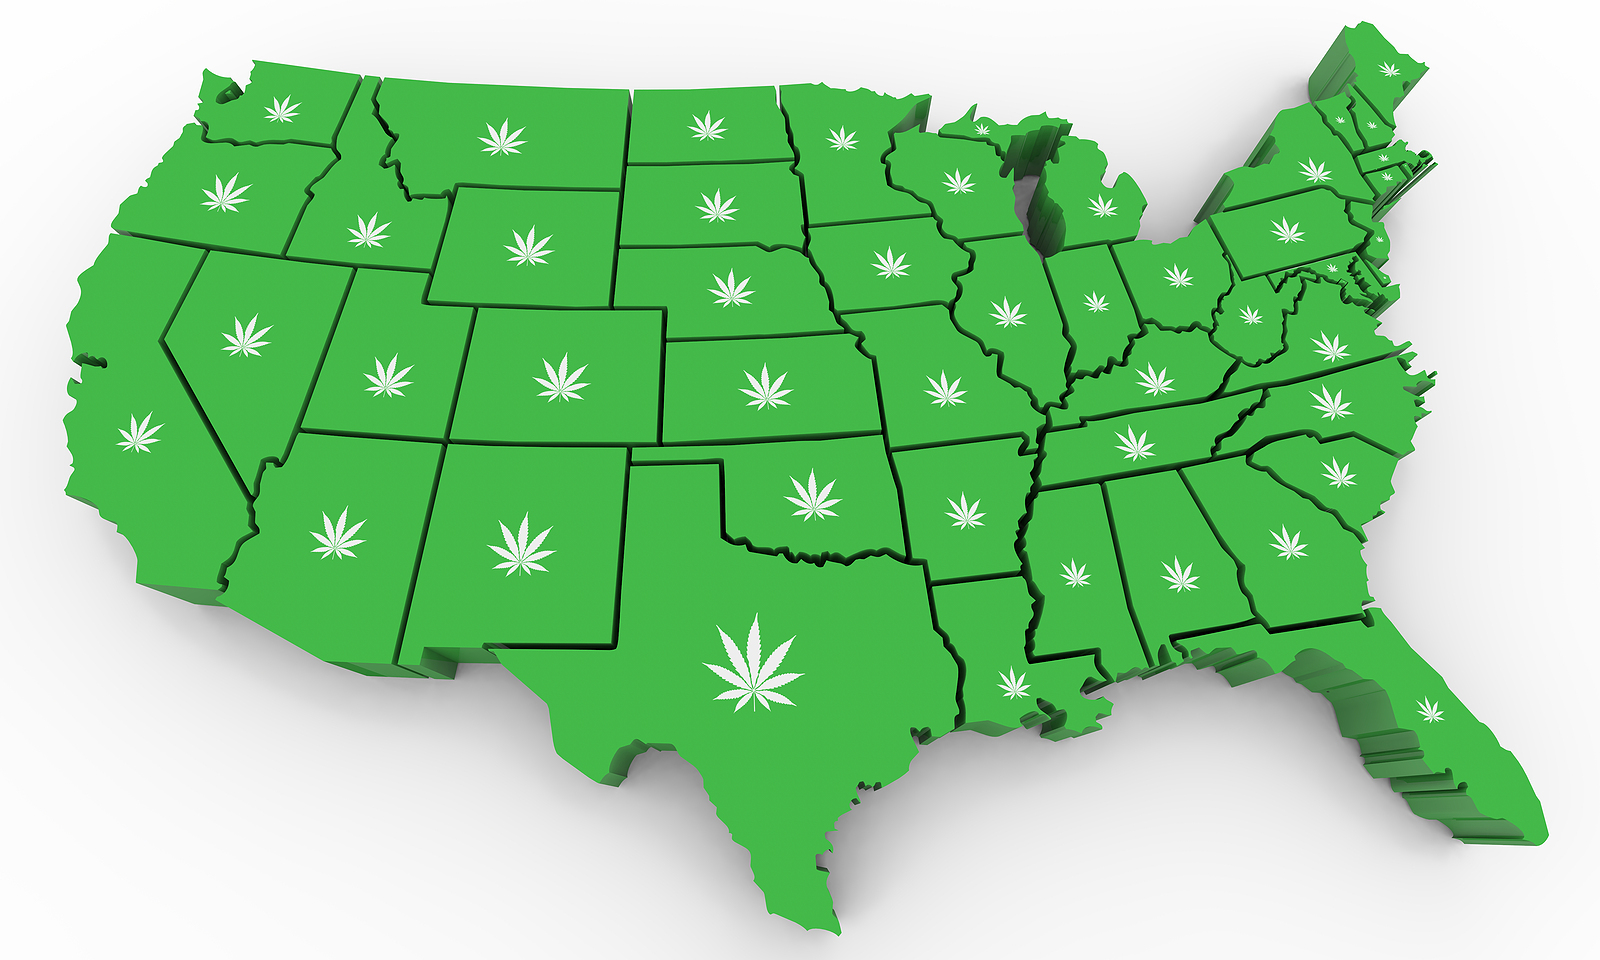 American cannabis stocks, marijuana stocks, pot stocks, legalization